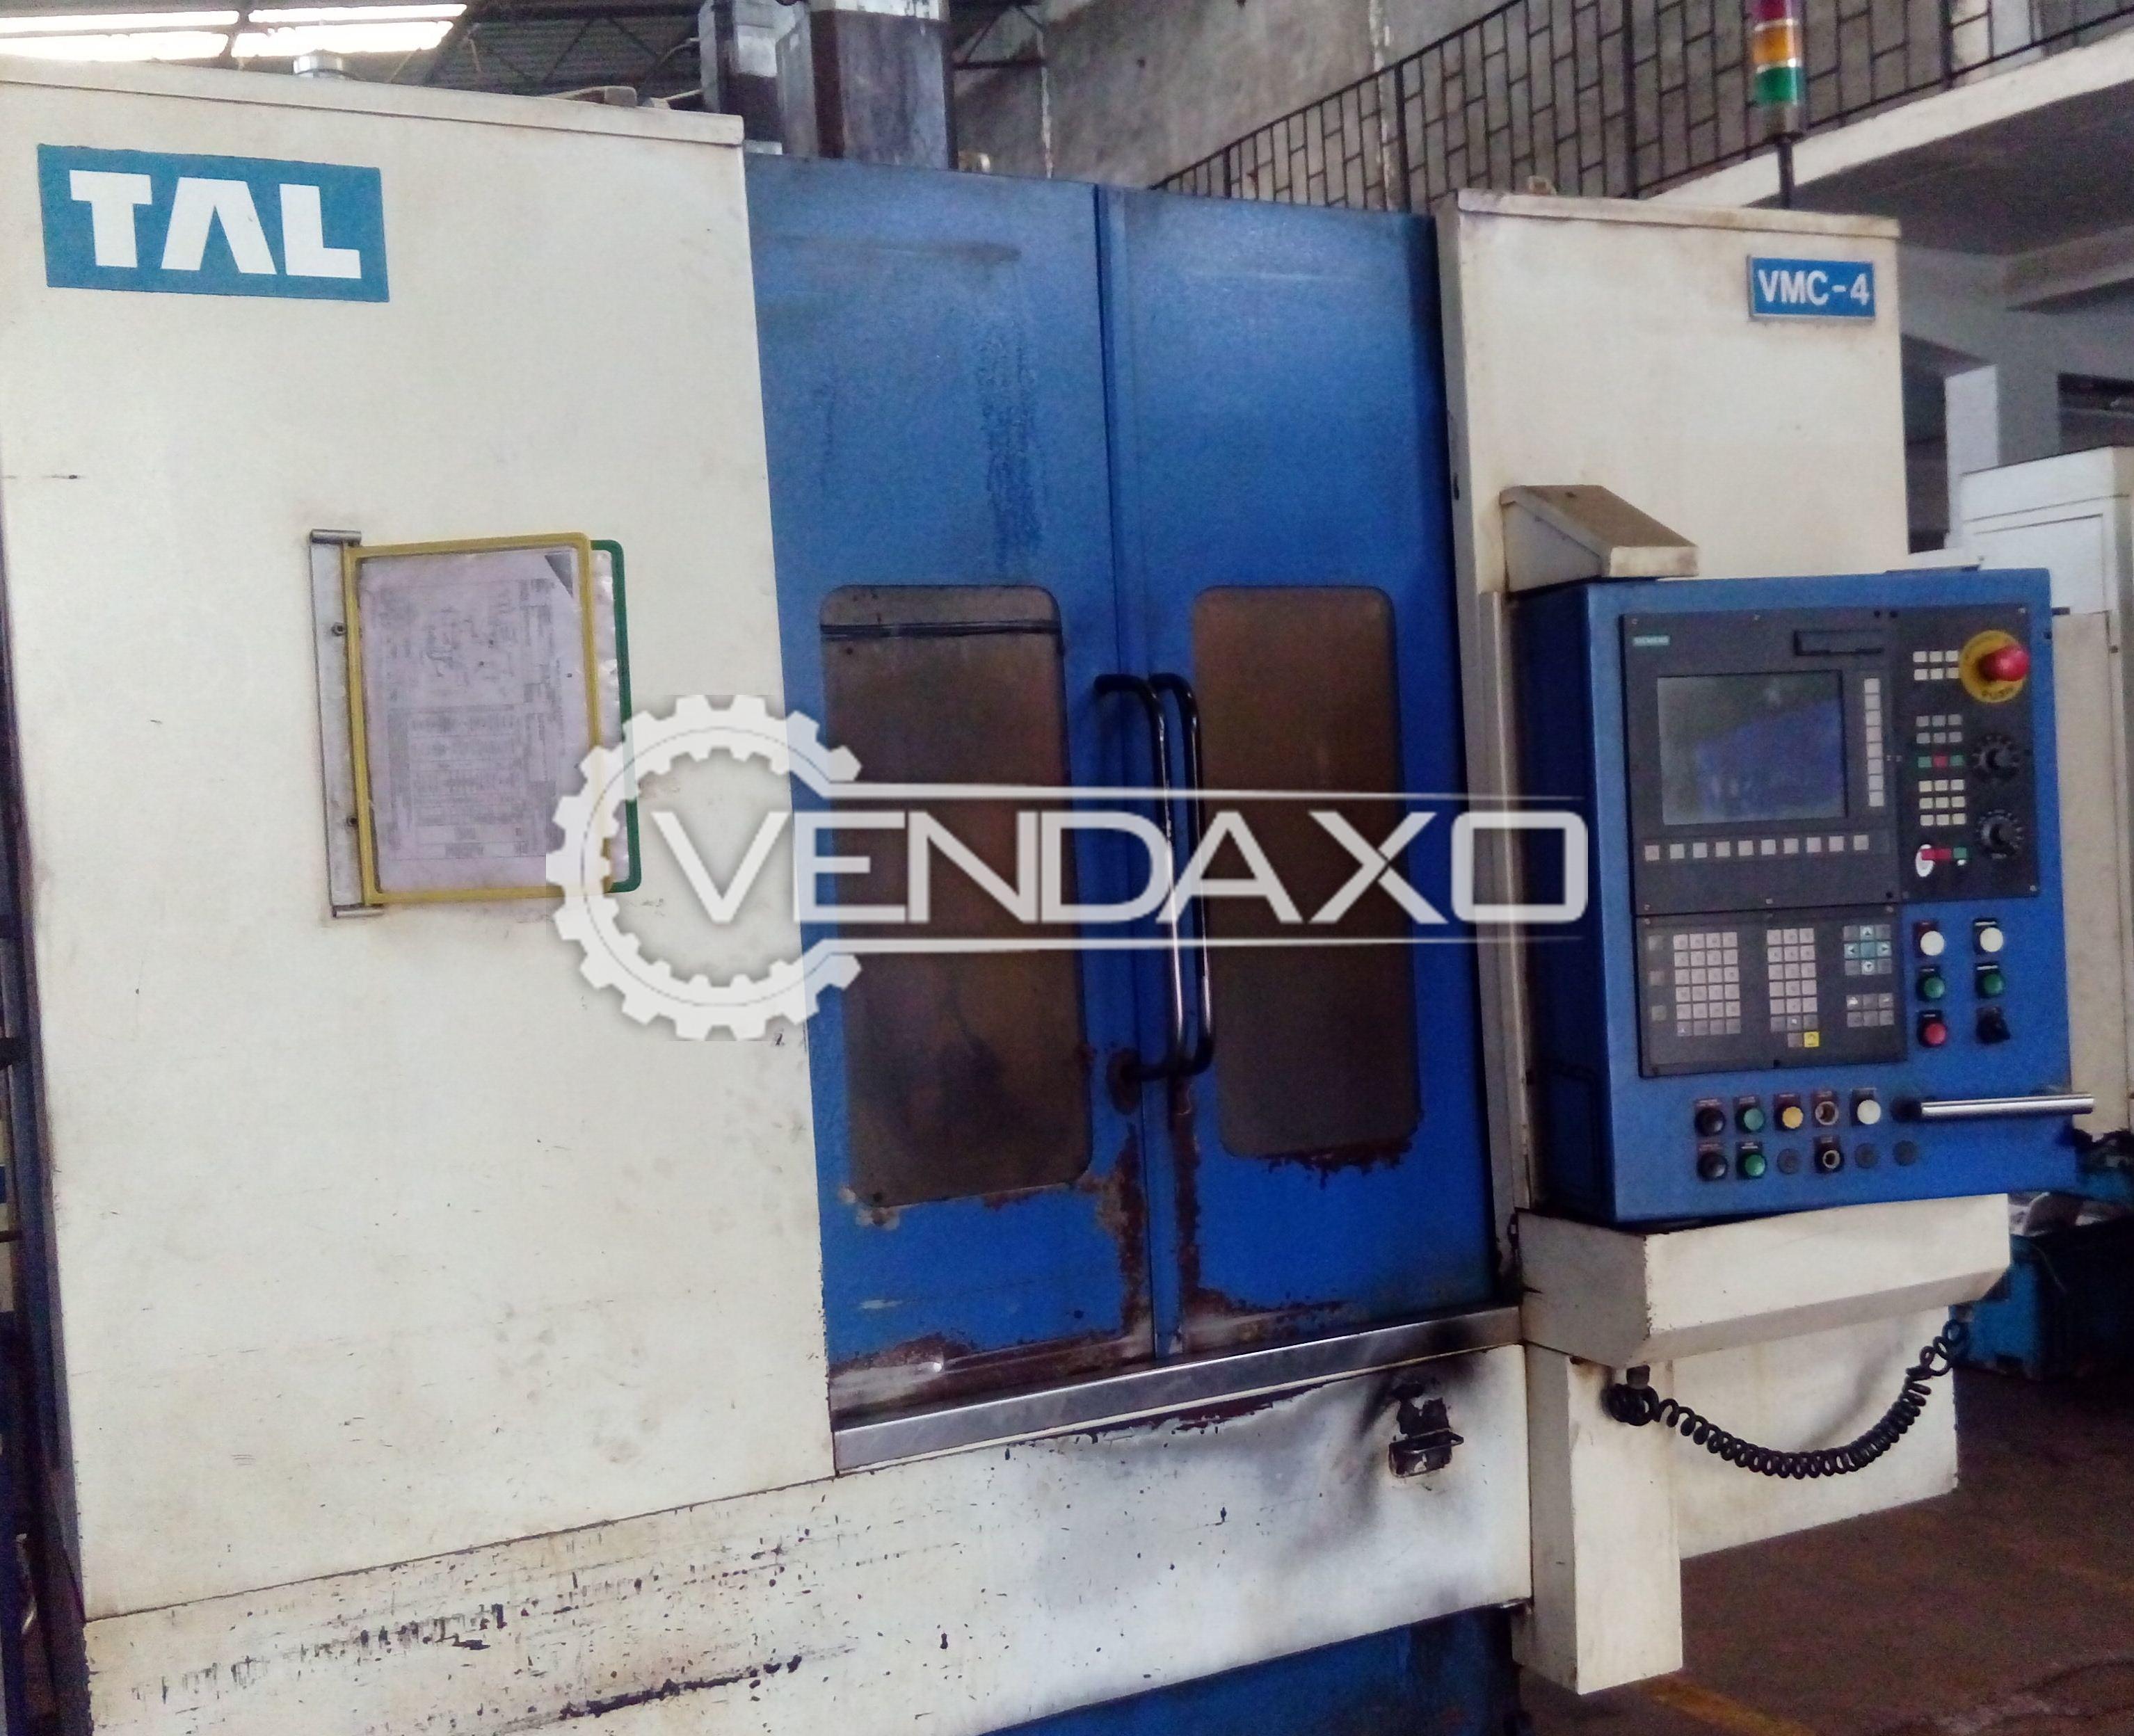 TAL CNC Vertical Machining Center VMC - Table Size - 700 x 400 mm